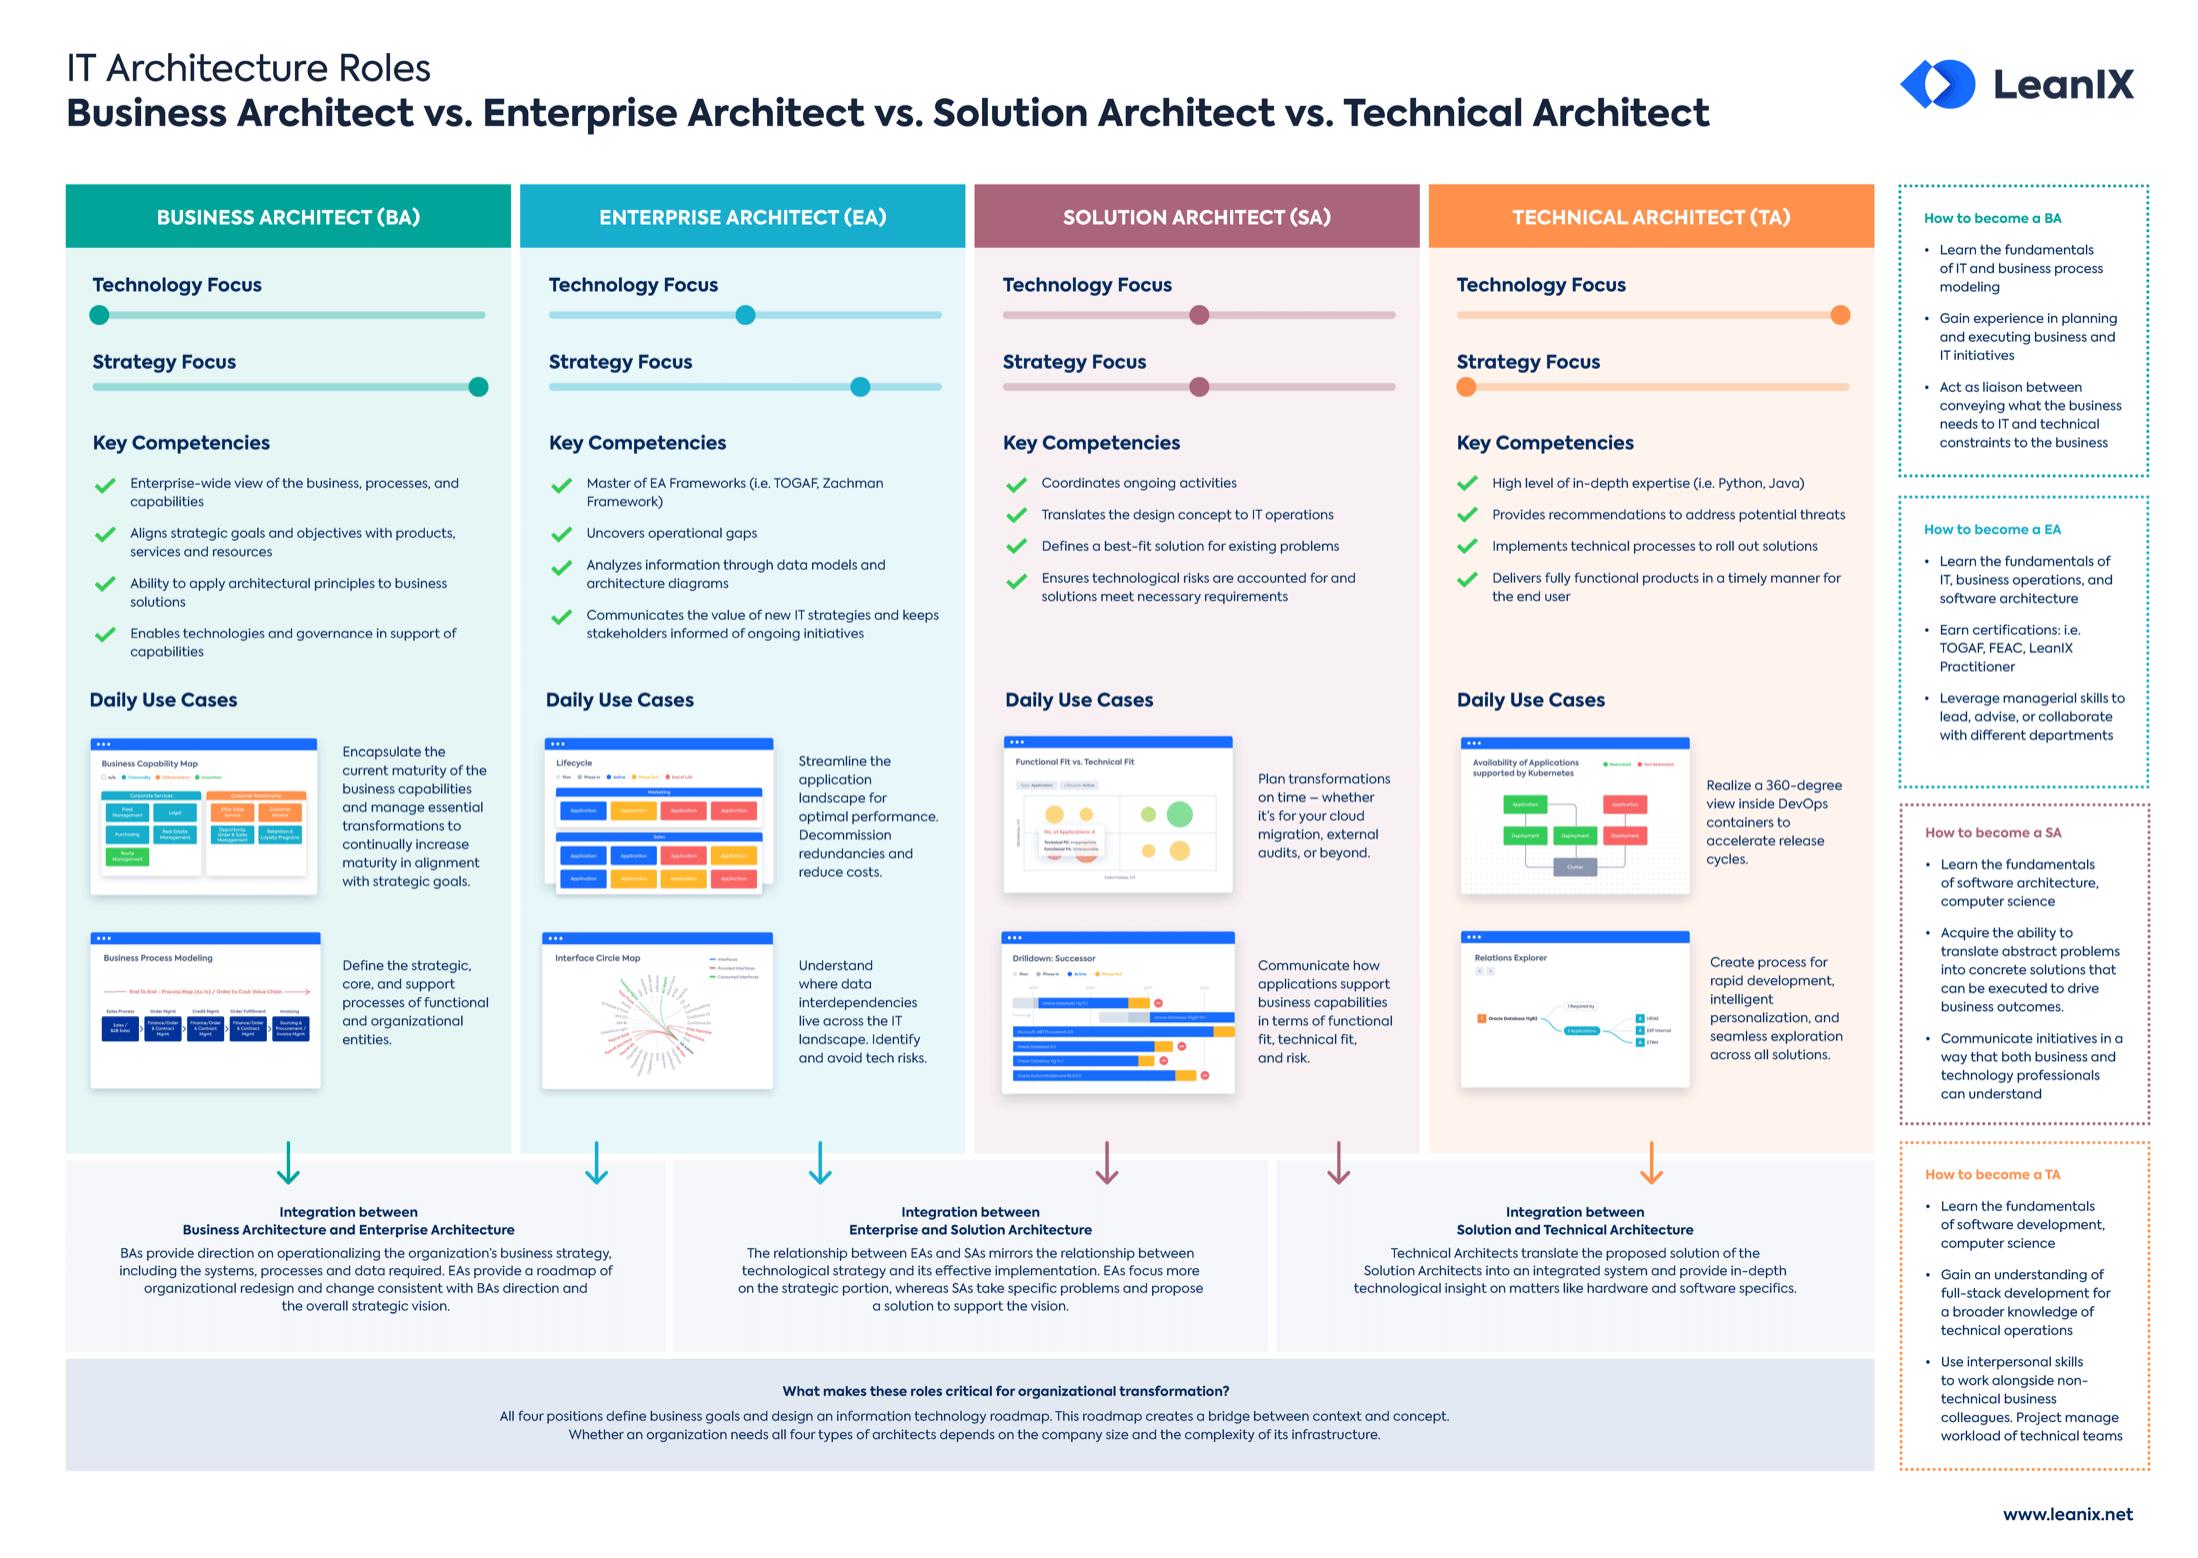 EN-IT-Arch-Roles_Poster_Landing_Page_Preview